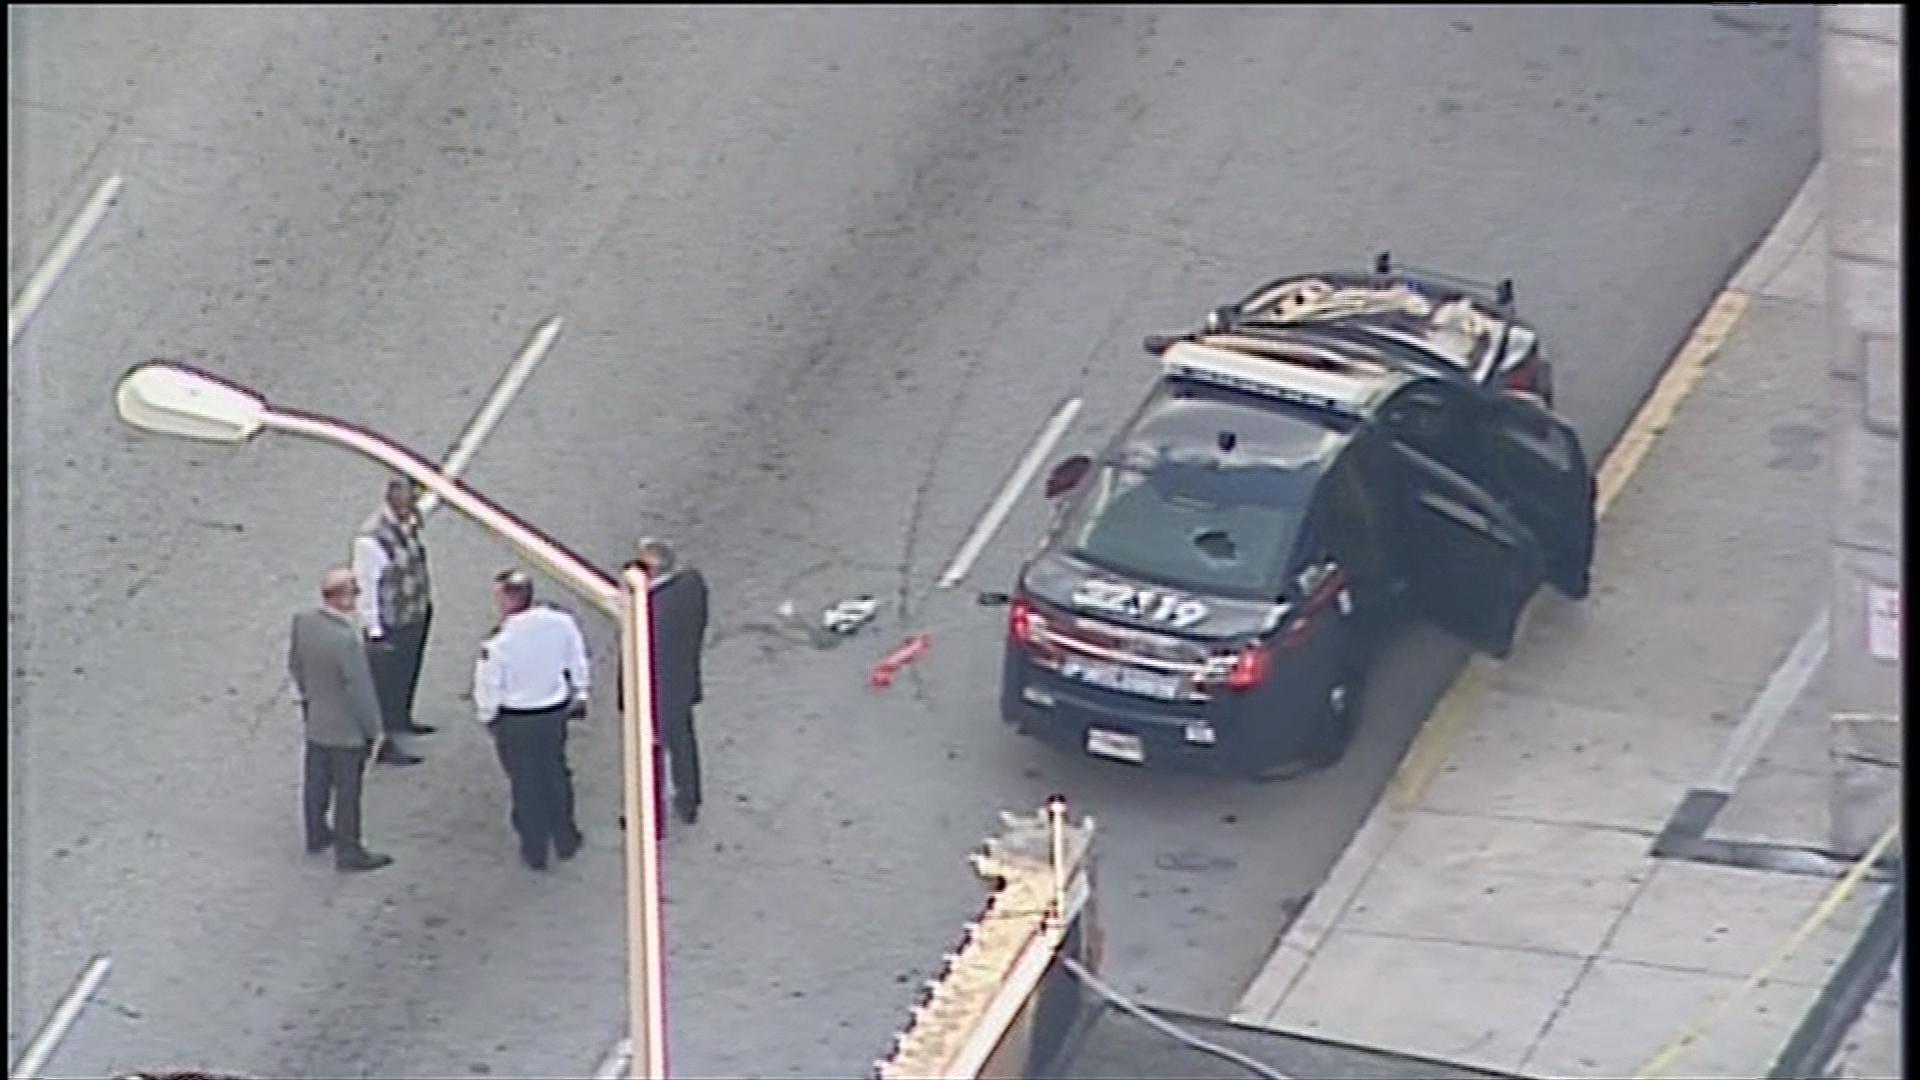 Atlanta Police Shooting: Suspect Dead After Firing on Cops From Inside Patrol Car